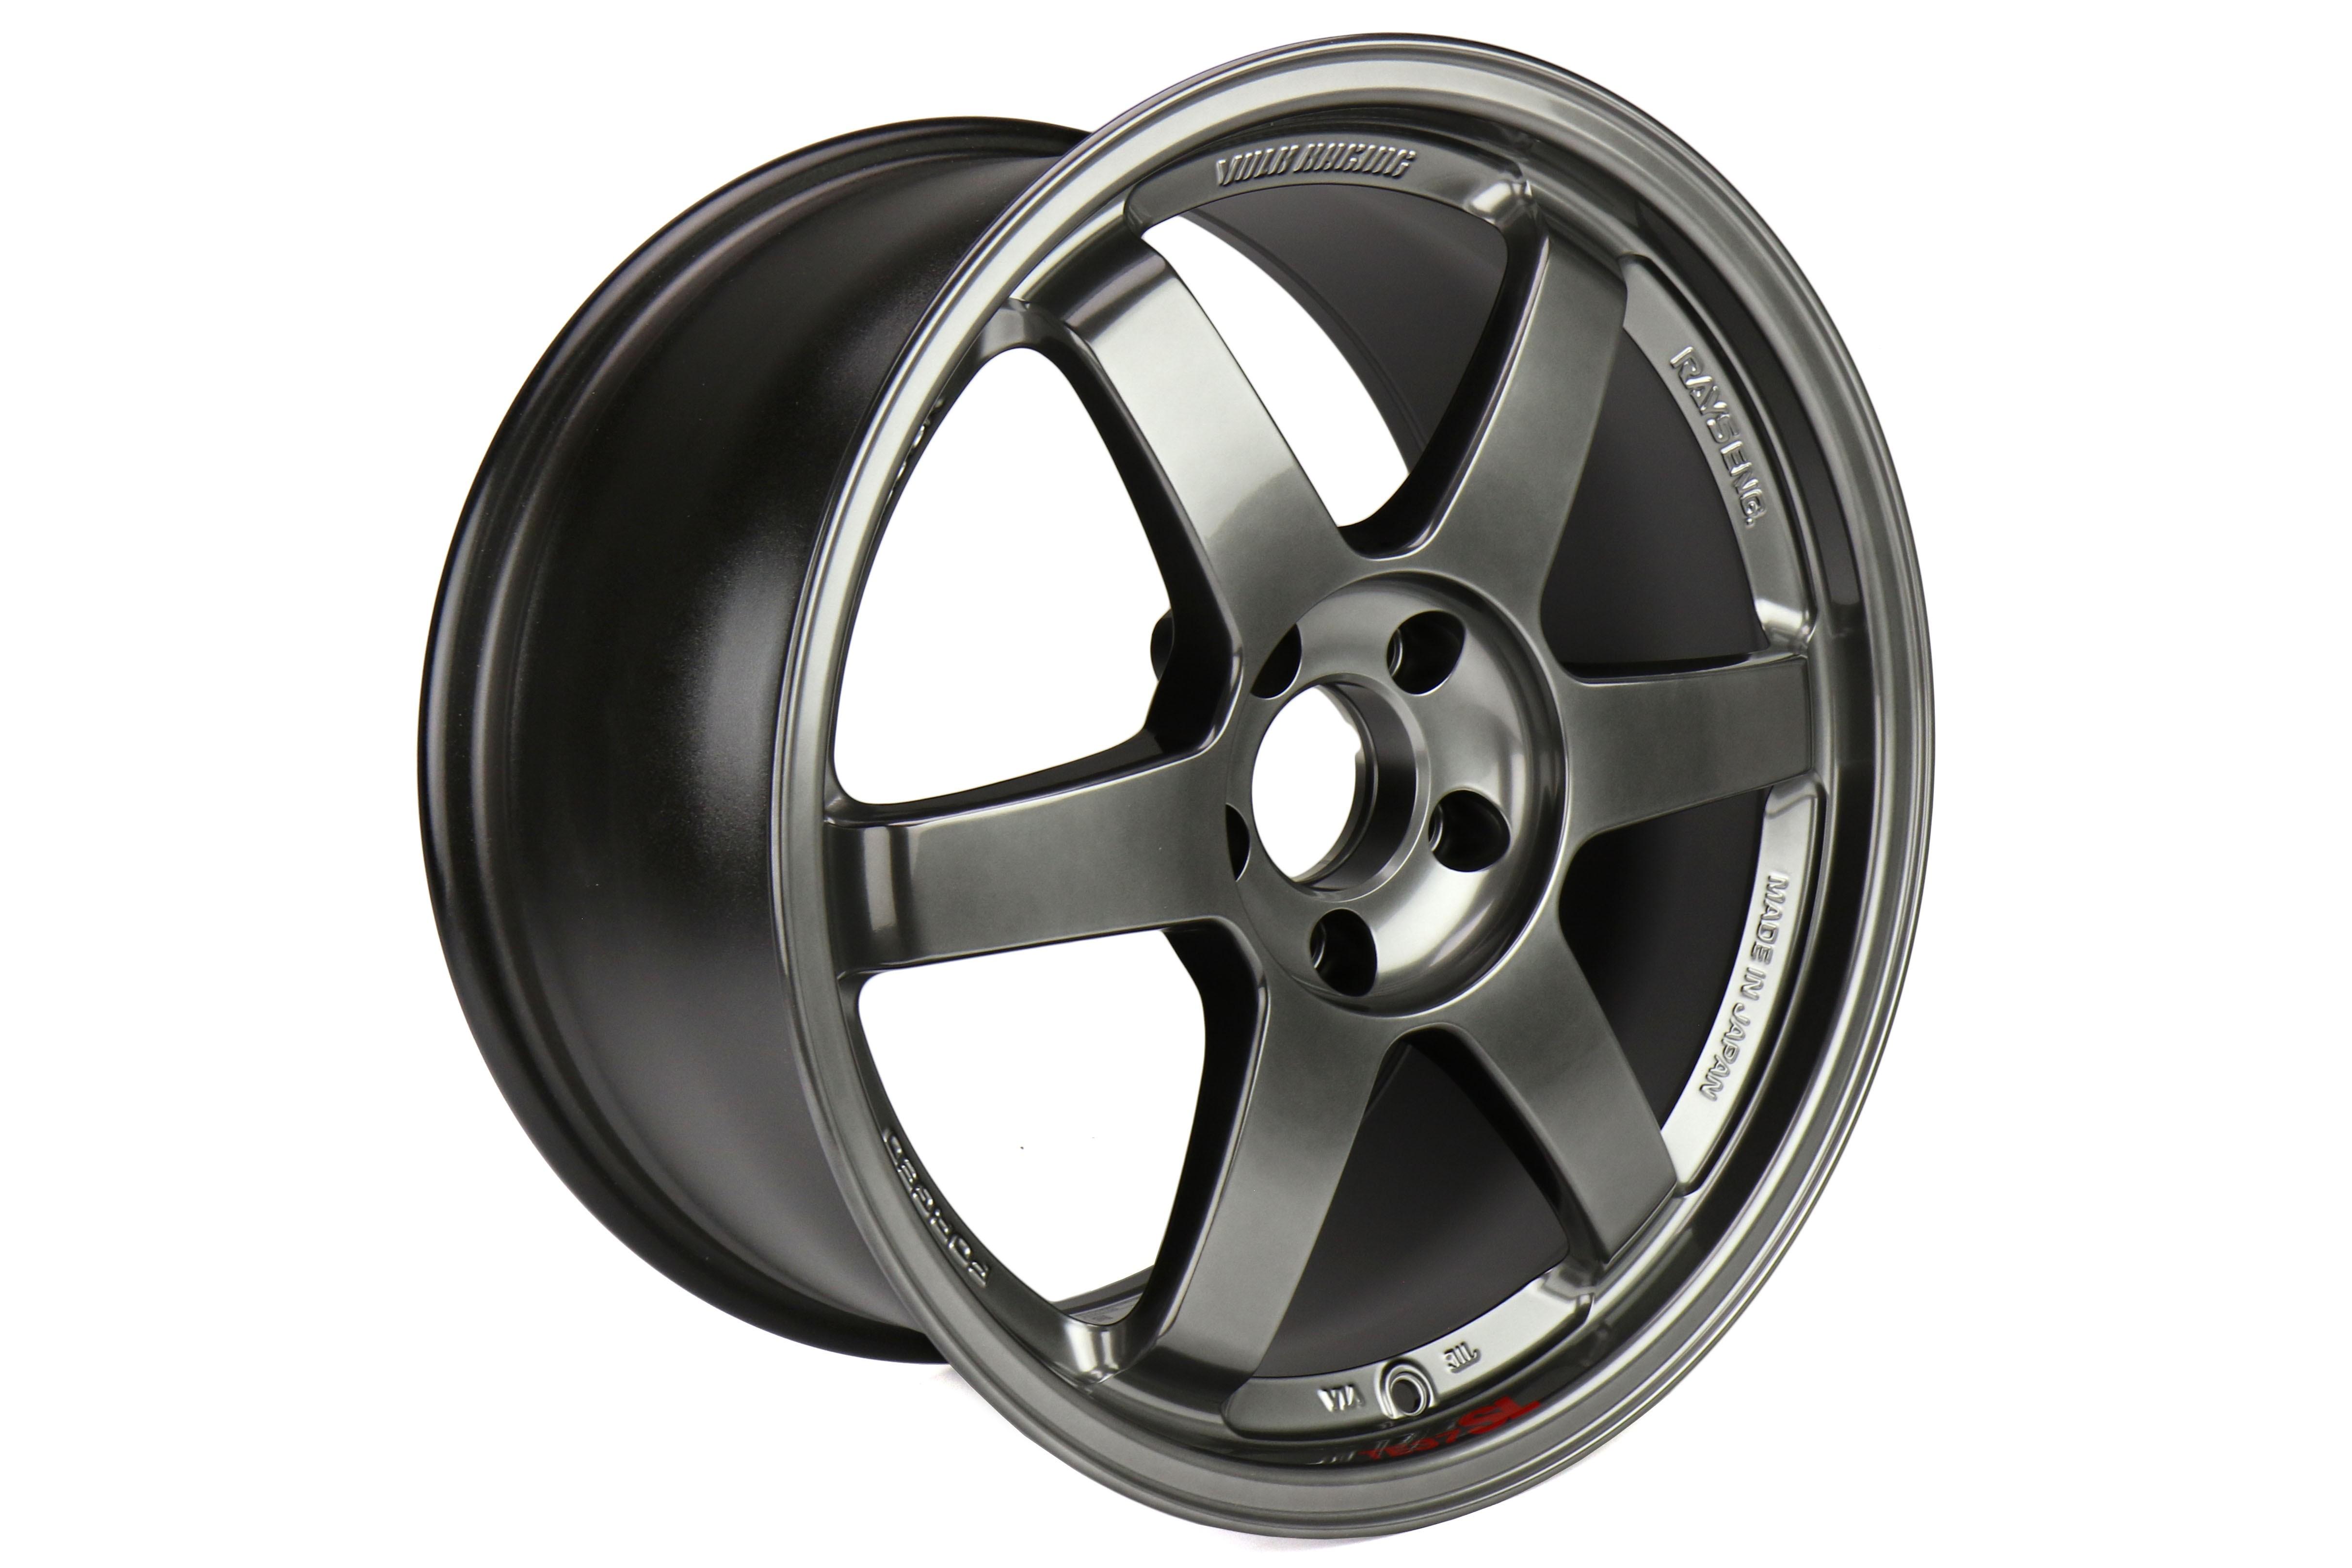 Volk TE37SL Formula Silver 19x9.5 +22 (Front) 19x10.5 +35 (Rear) - 2020+ A90 Supra